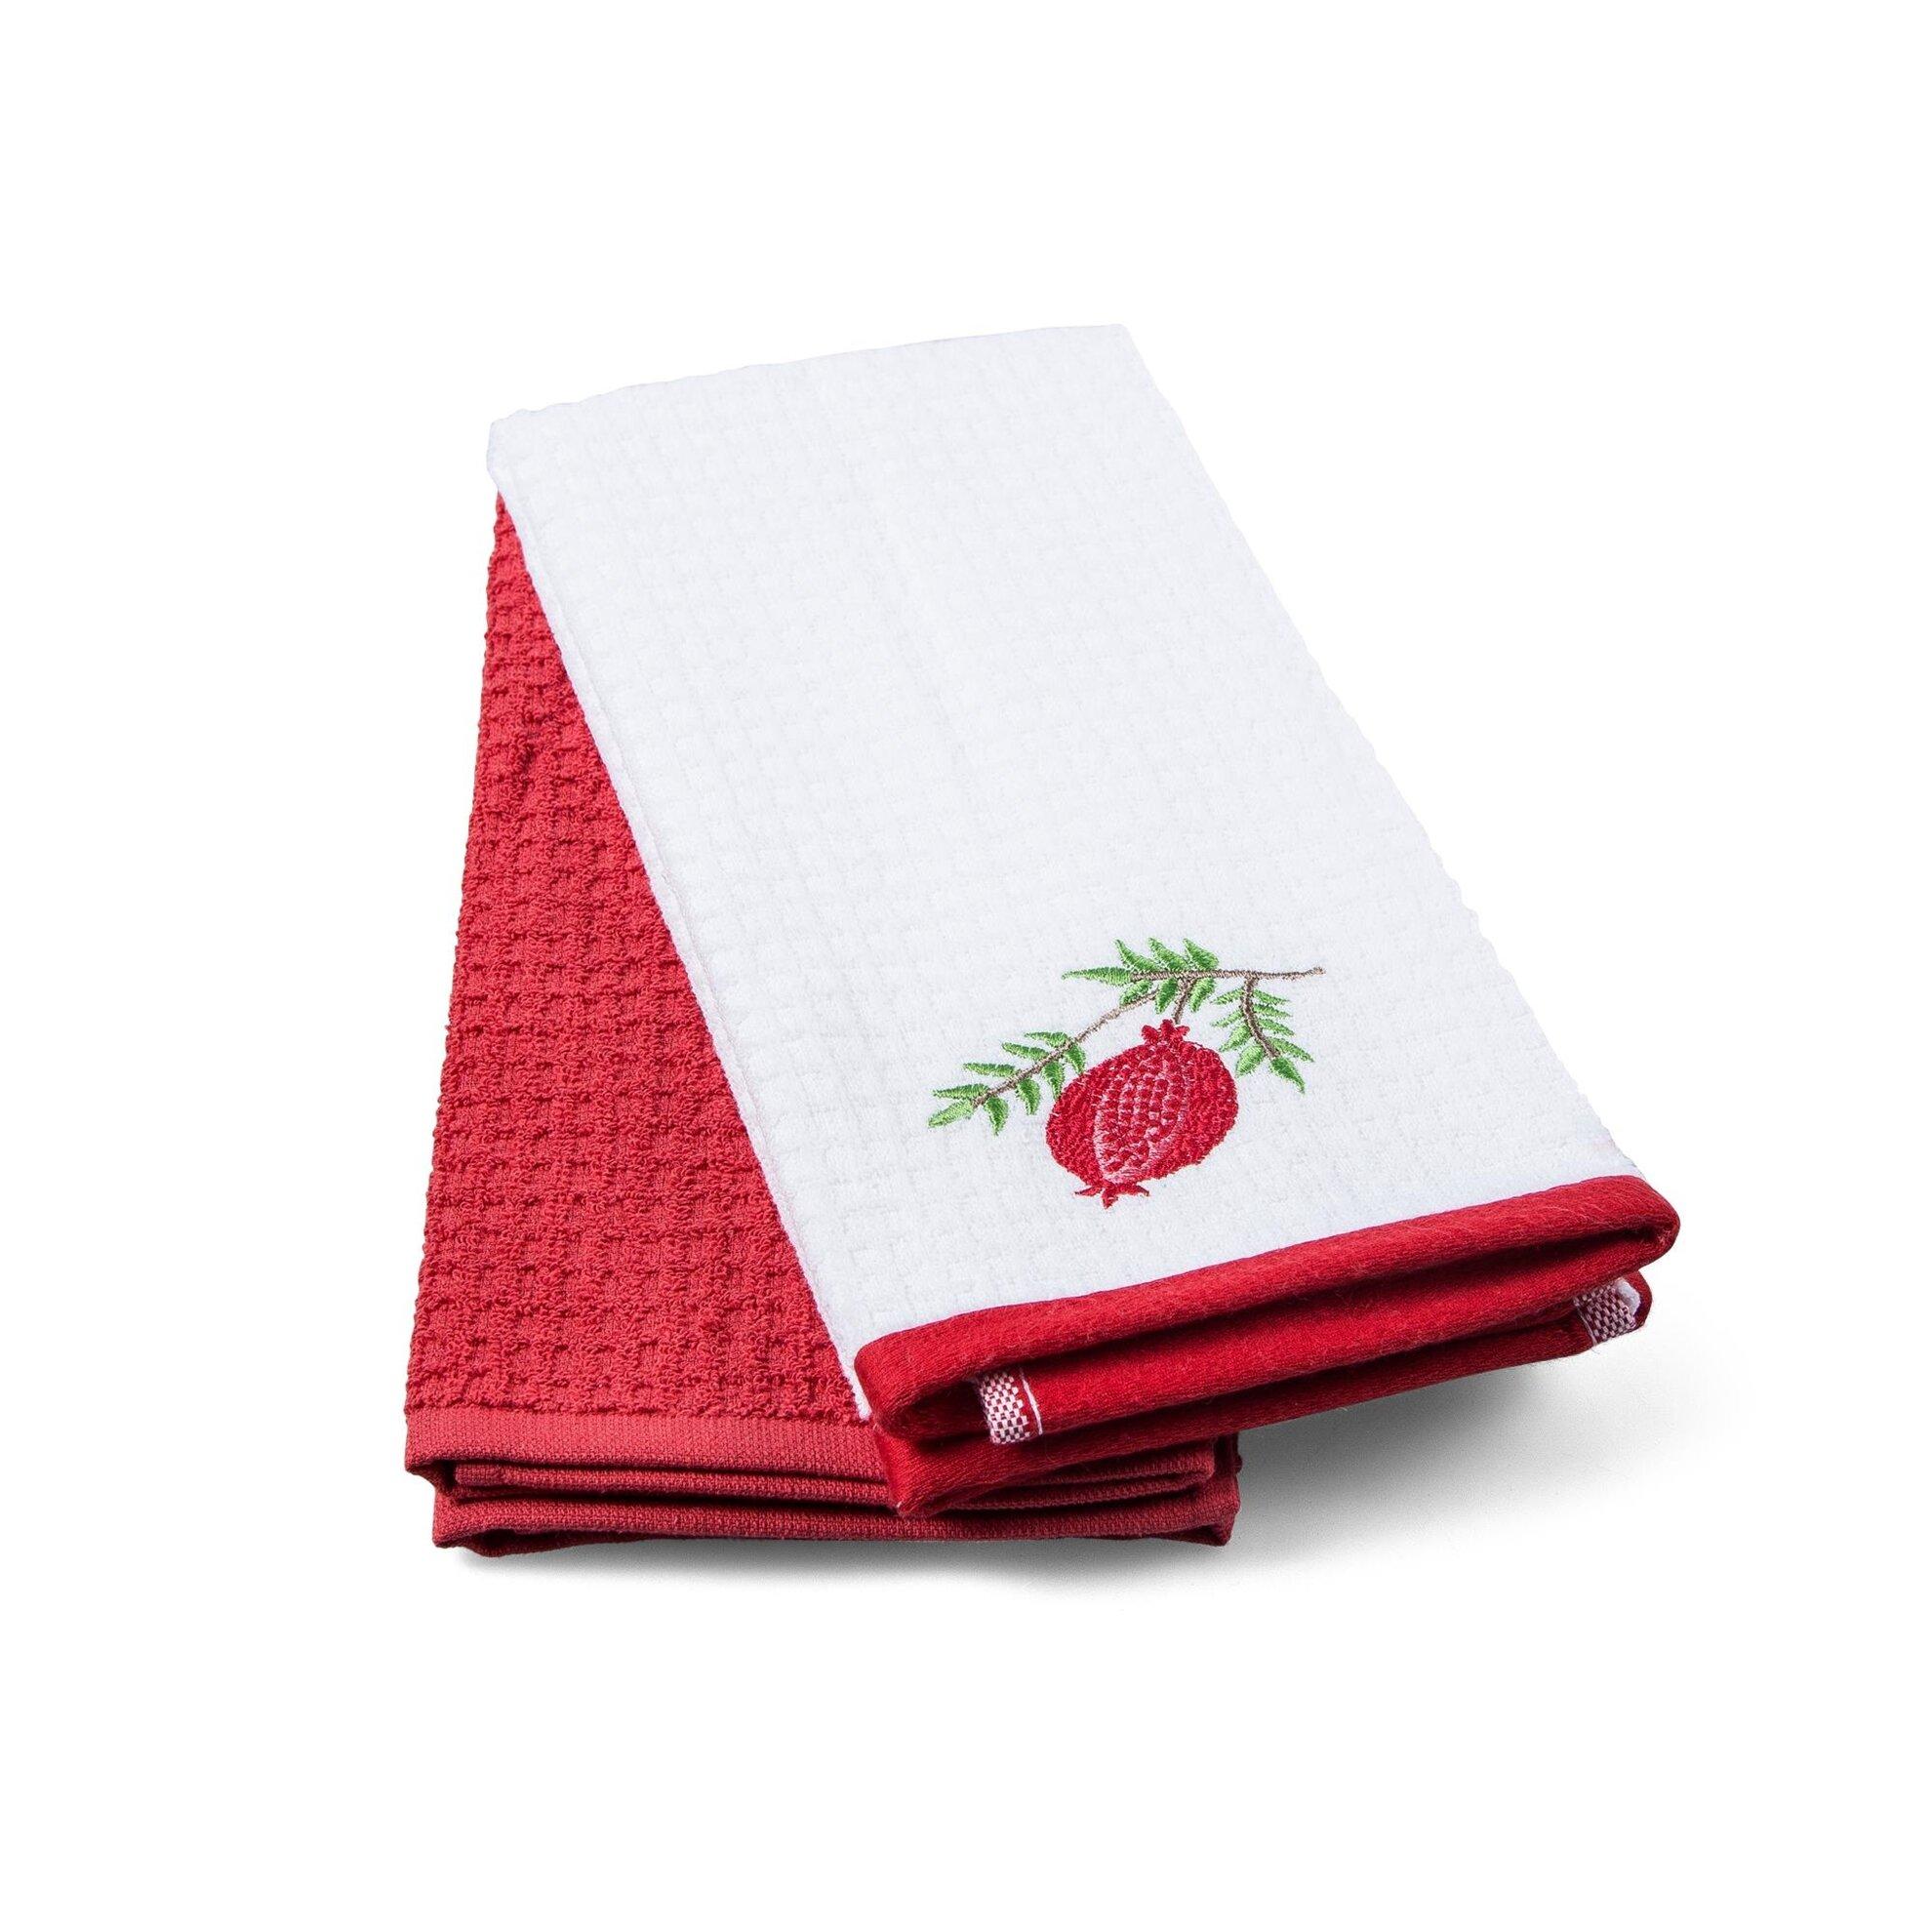 resm Taç Pomegranate Pamuk Mutfak Havlusu Kırmızı